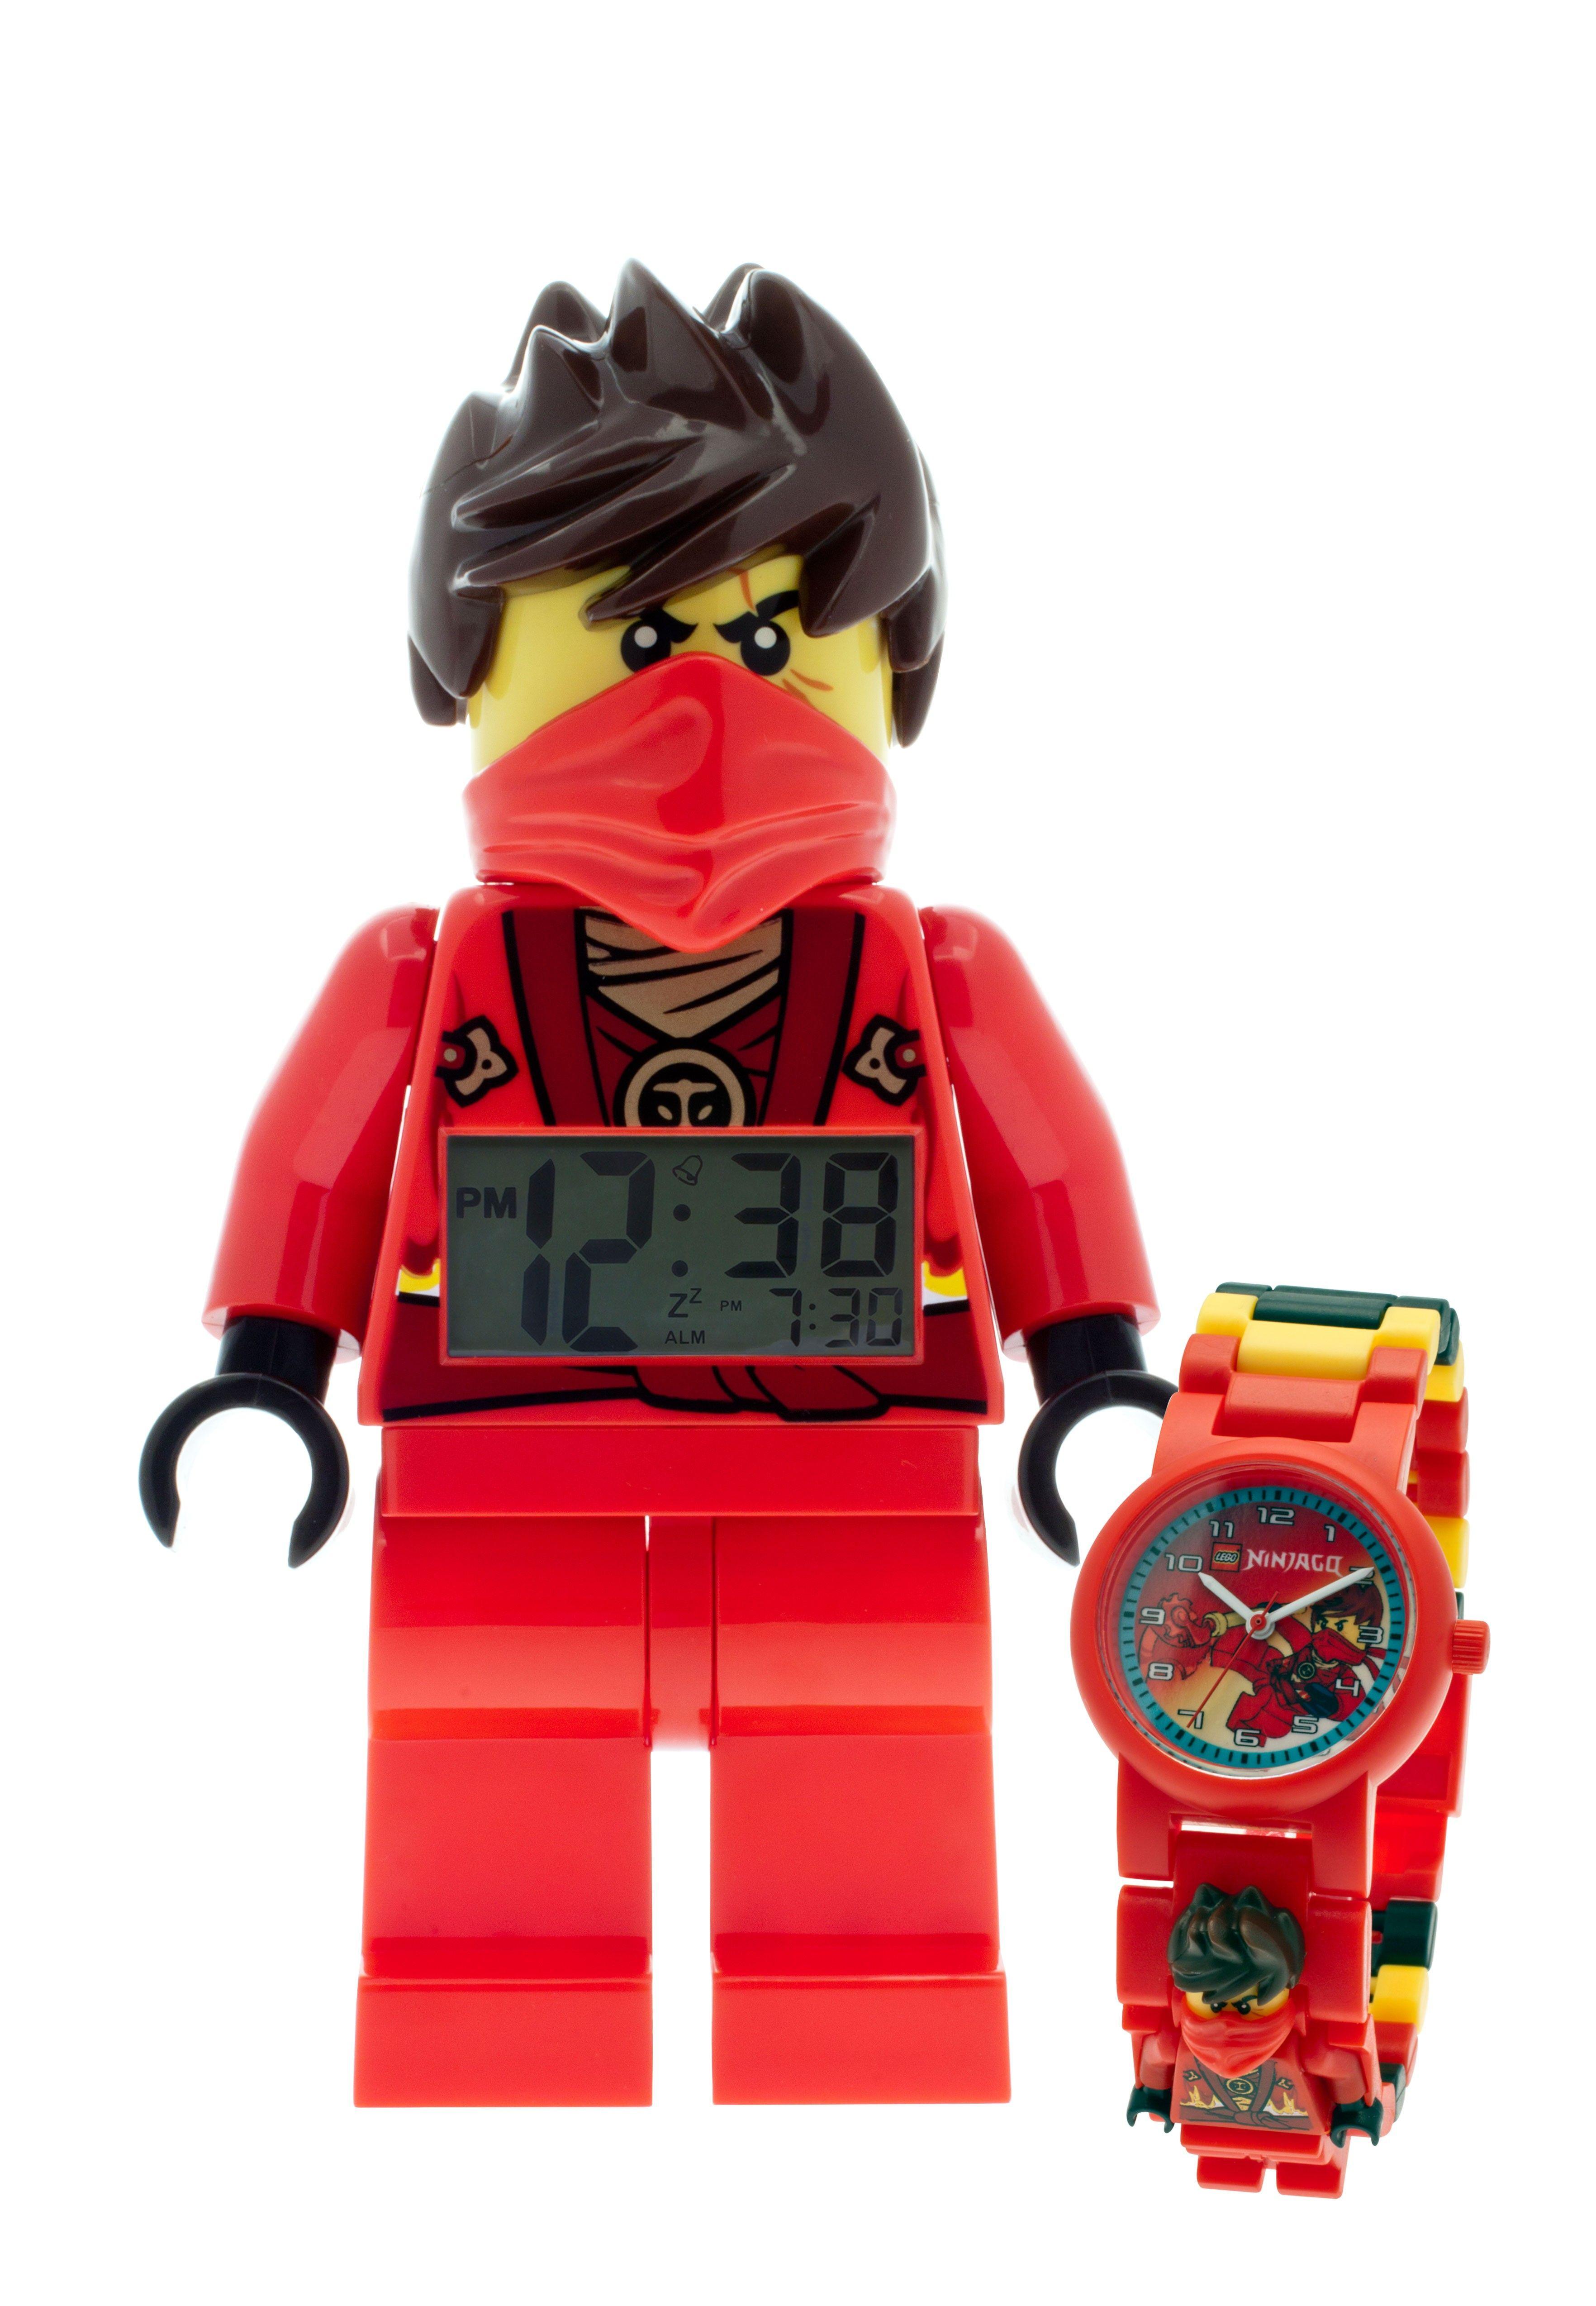 LEGO Ninjago Rebooted Kai clock and watch bundle   Lego